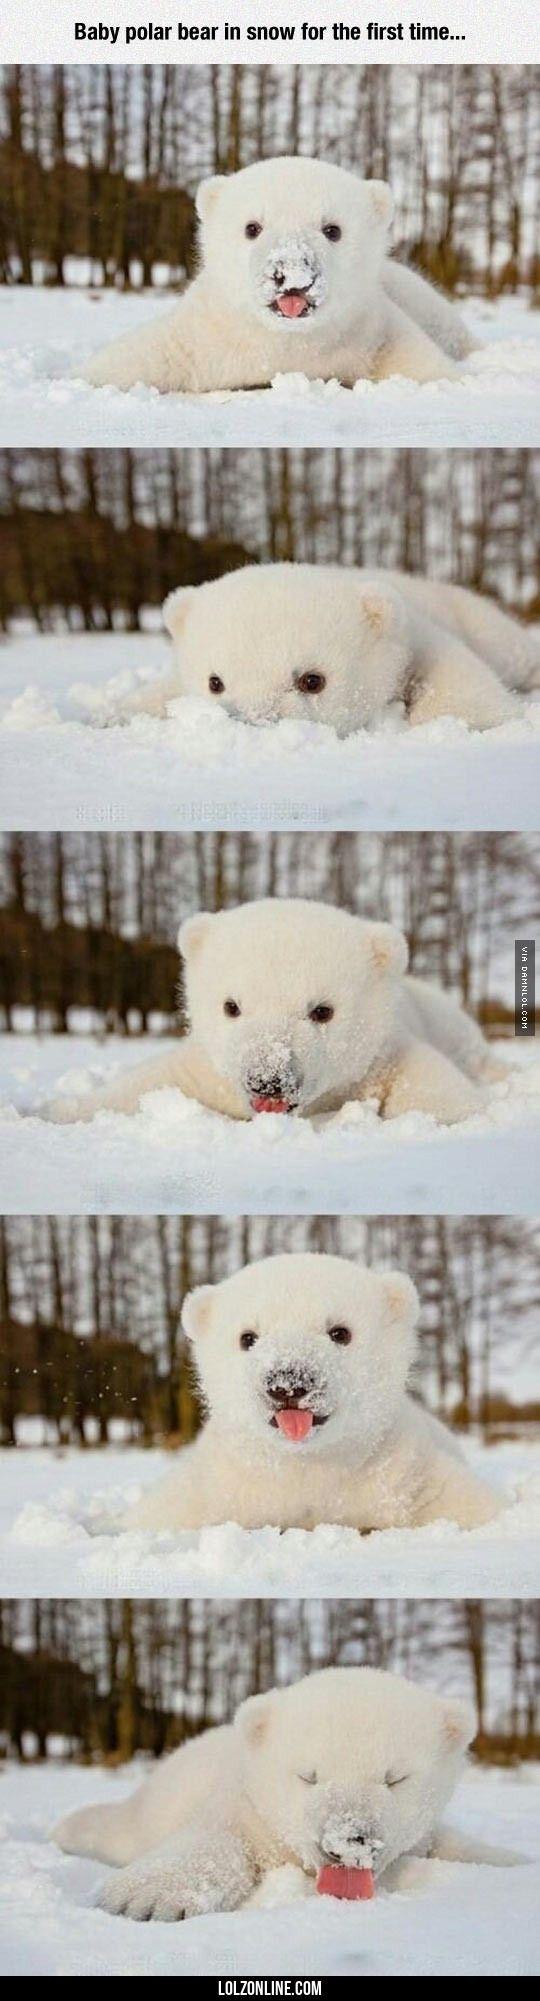 Enjoying The Snow#funny #lol #lolzonline